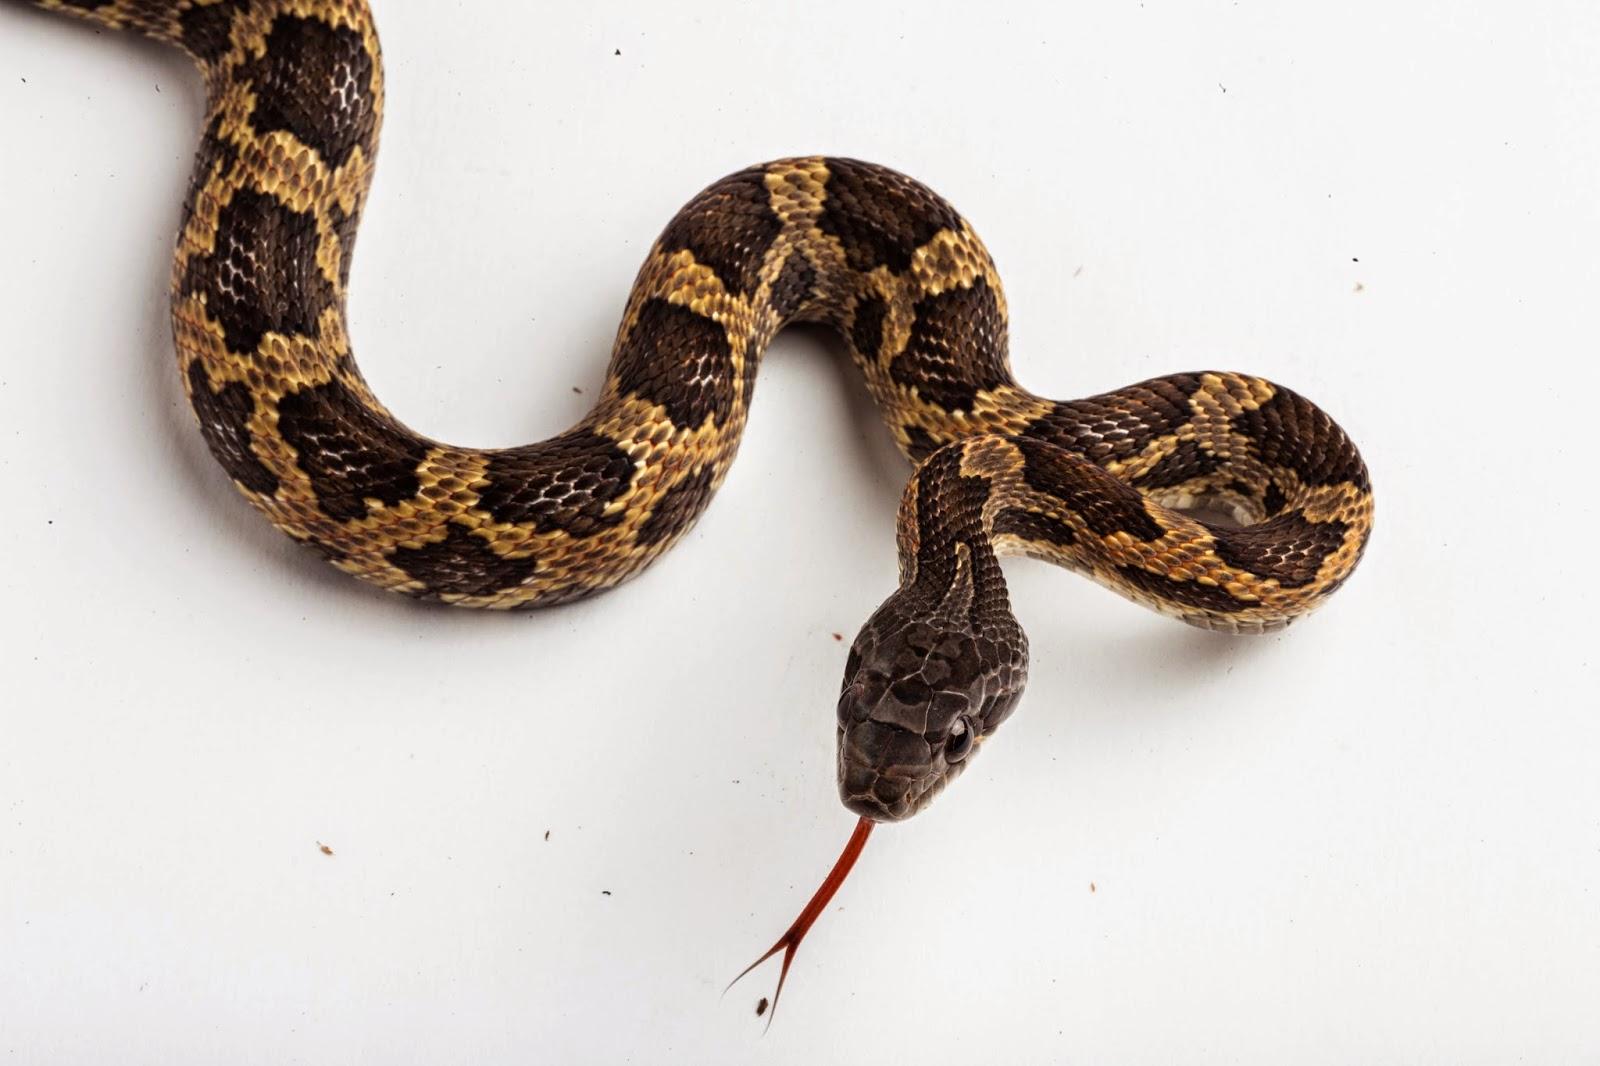 rat snake texas images - photo #9